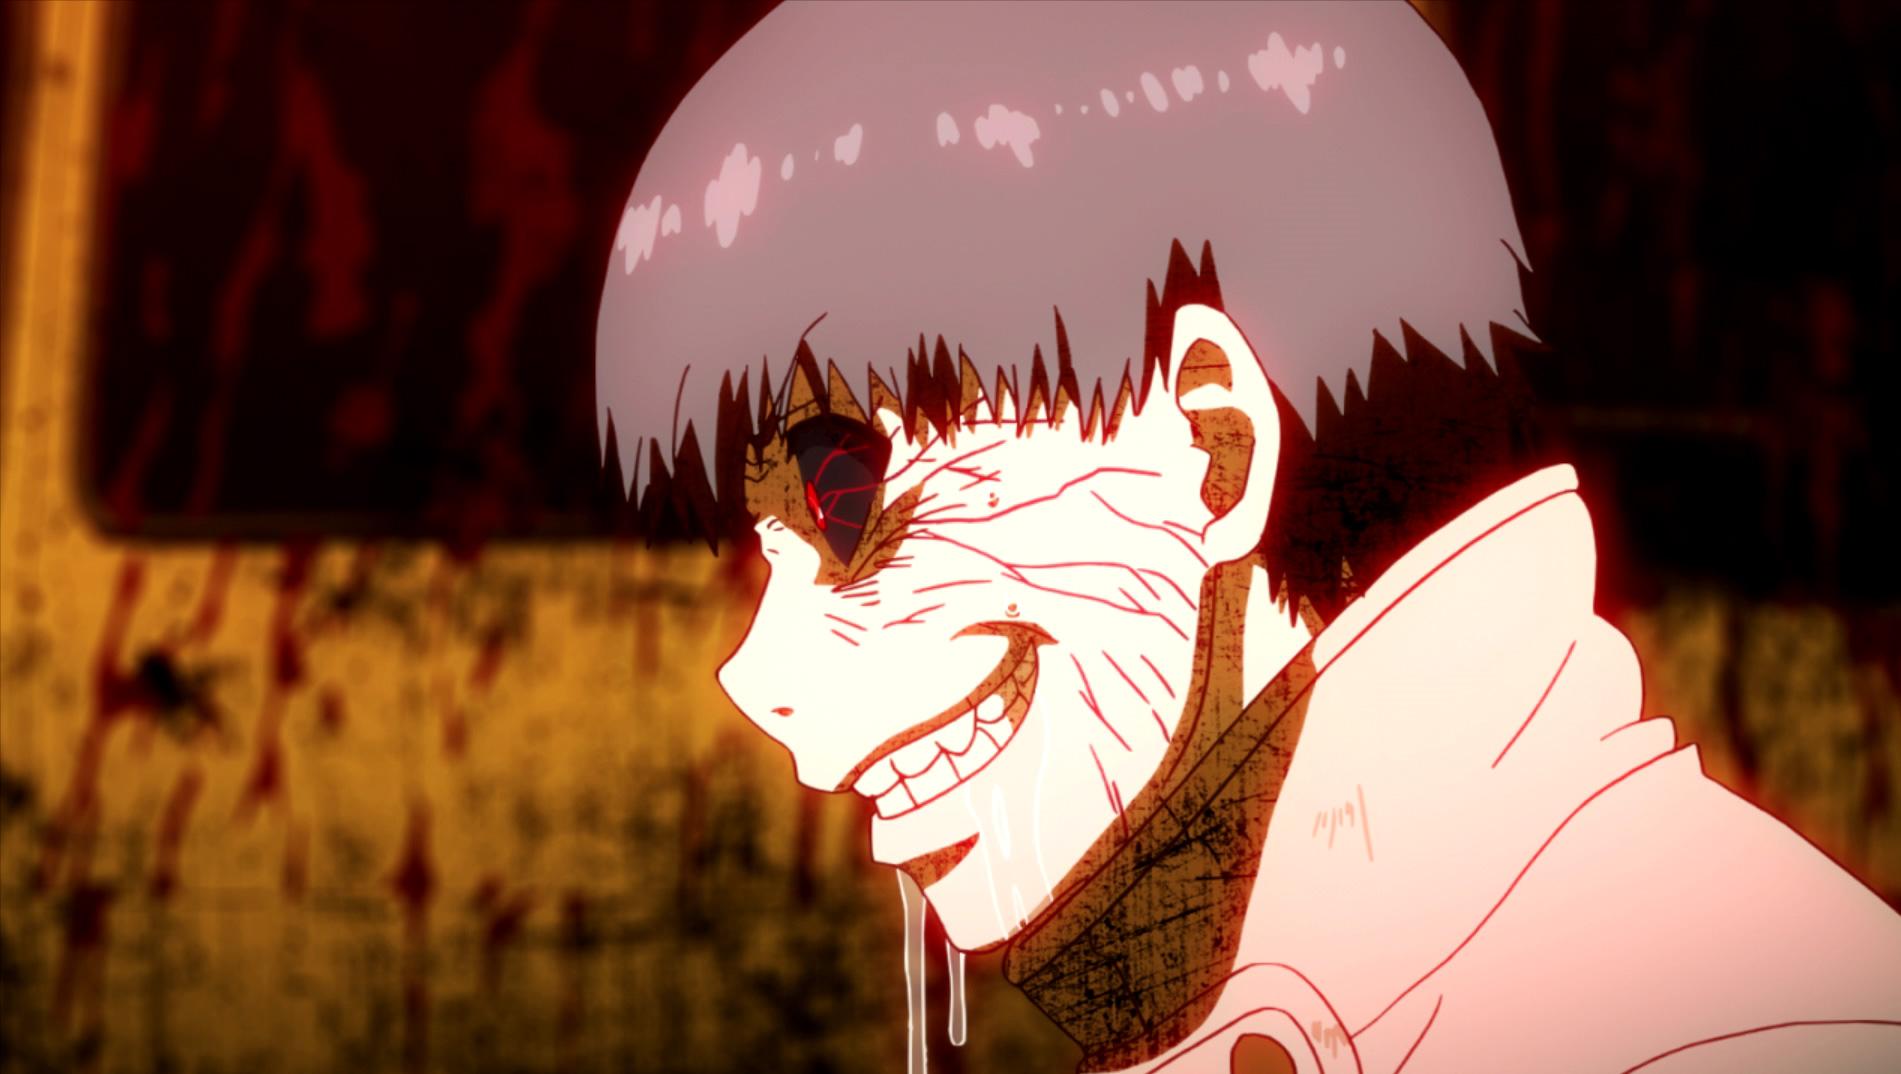 Watch Tokyo Ghoul Season 1 Episode 2 Sub & Dub | Anime Uncut